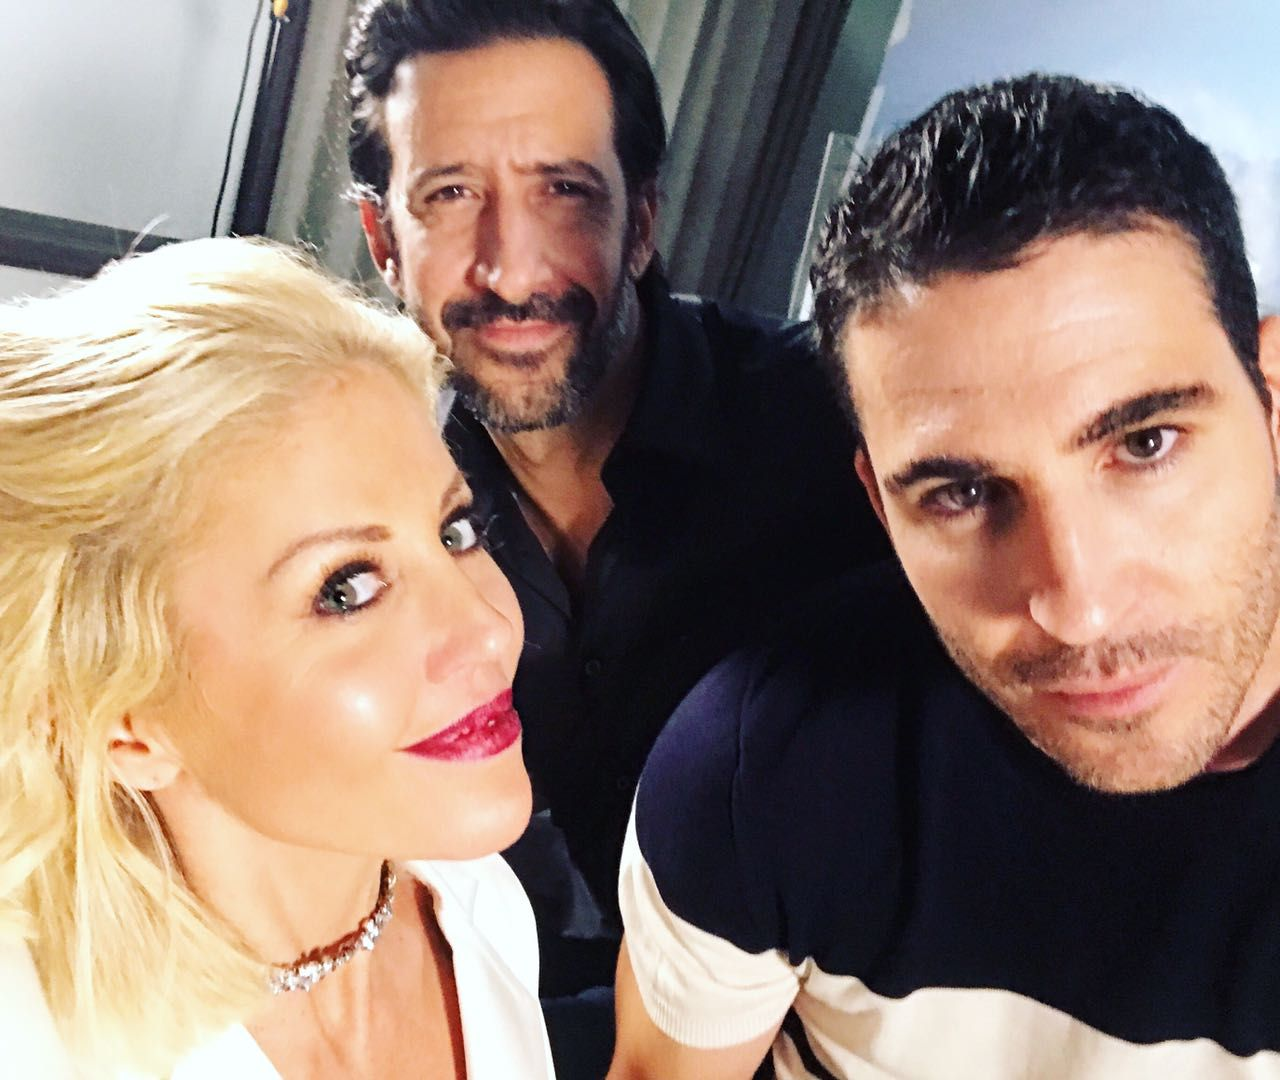 Barbie Simons en exclusiva con Miguel Ángel Silvestre